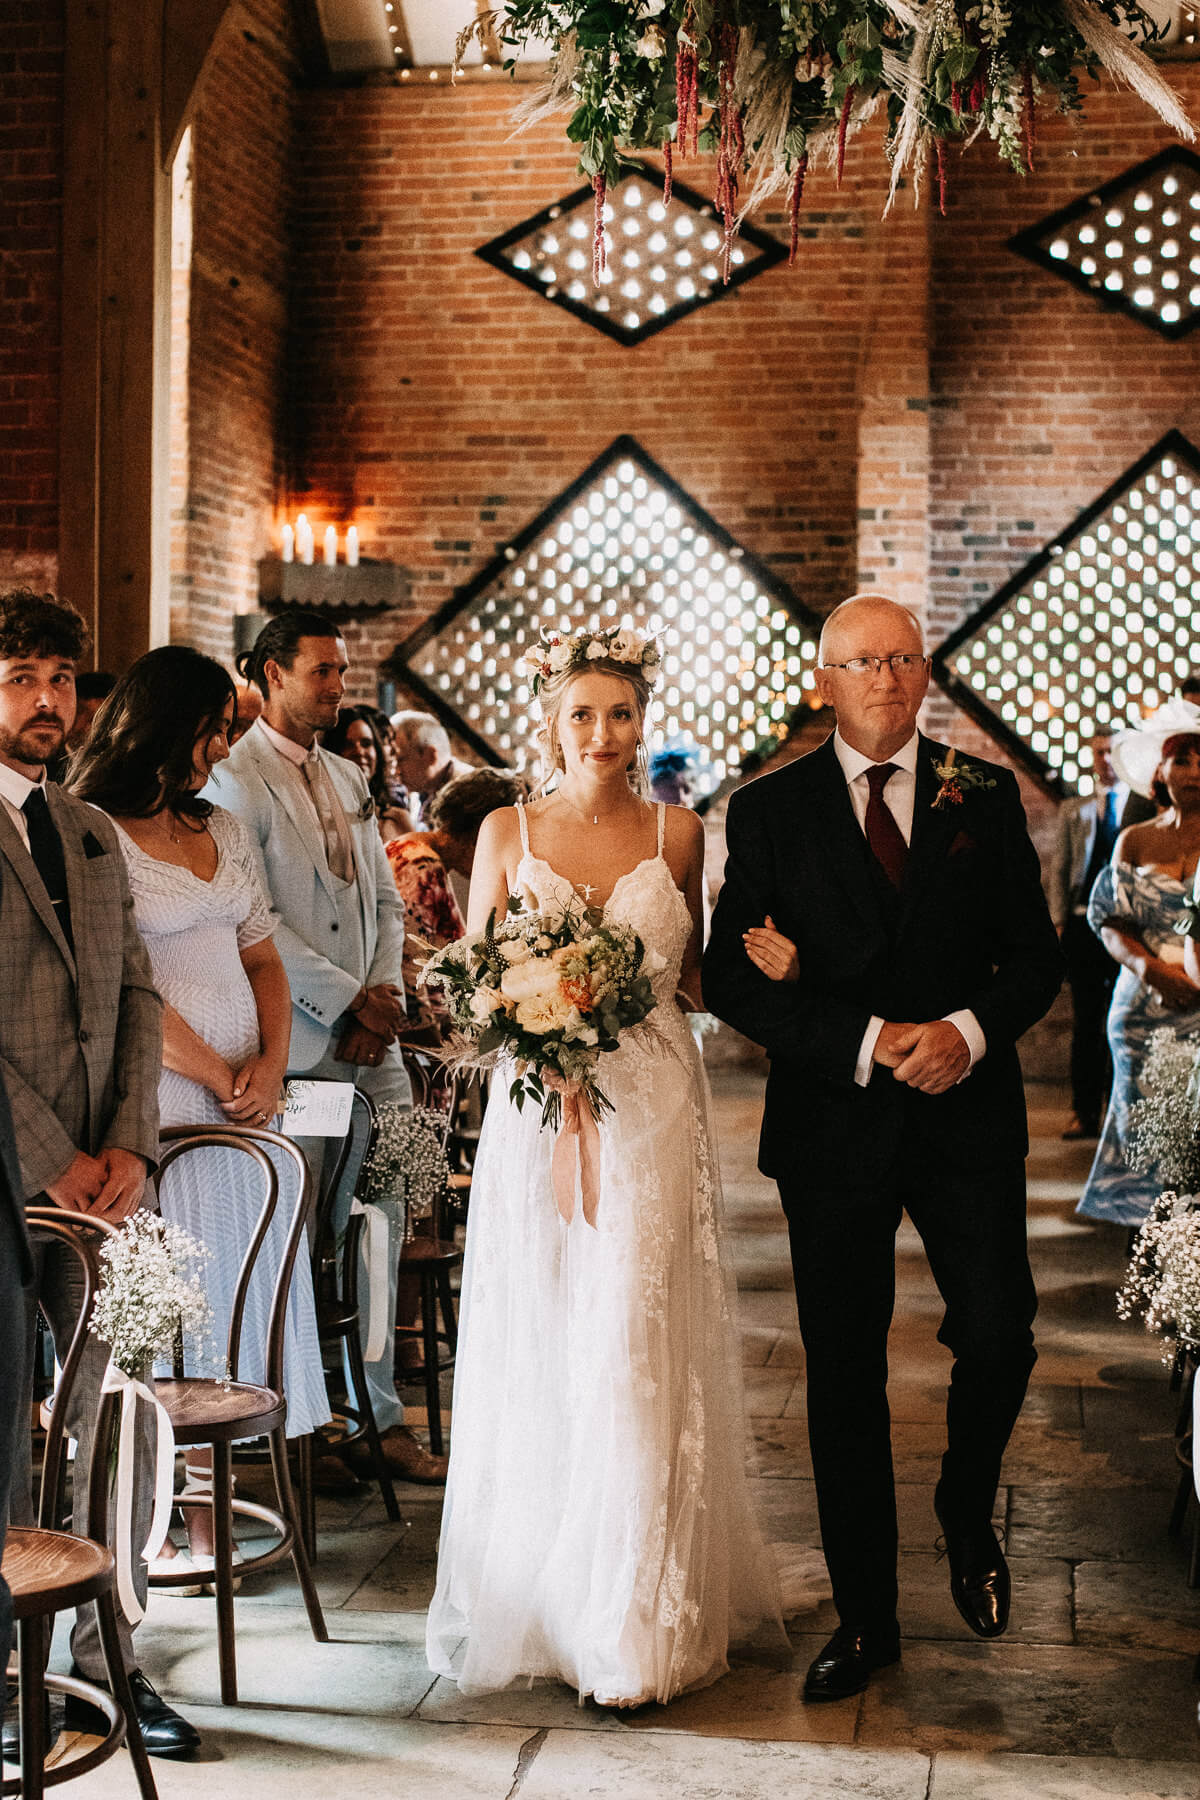 Bride walking down the aisle wearing a flower cronwn